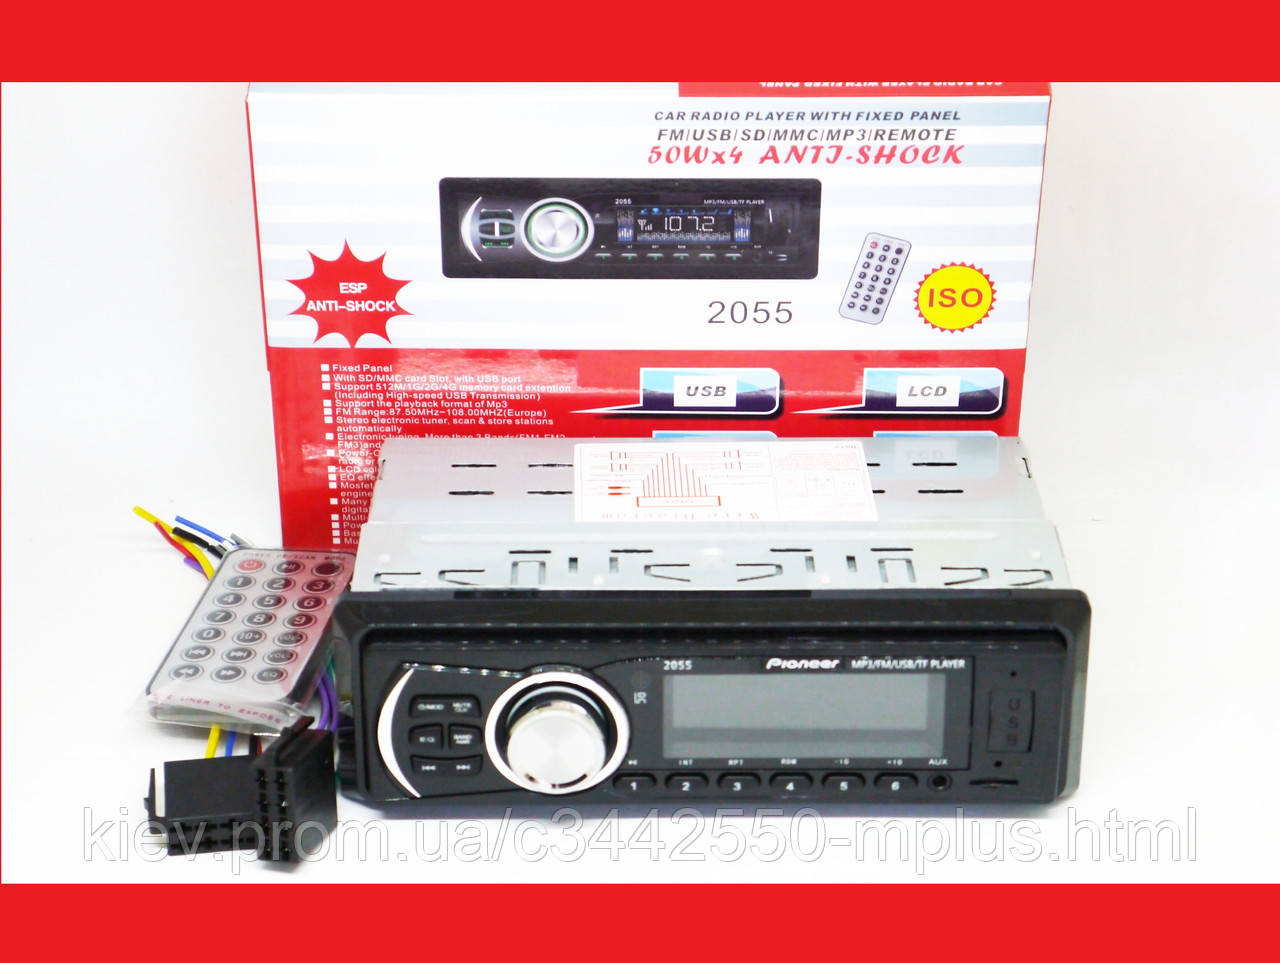 Автомагнитола Pioneer 2055 ISO Usb+Sd+Fm+Aux+ пульт (4x50W)